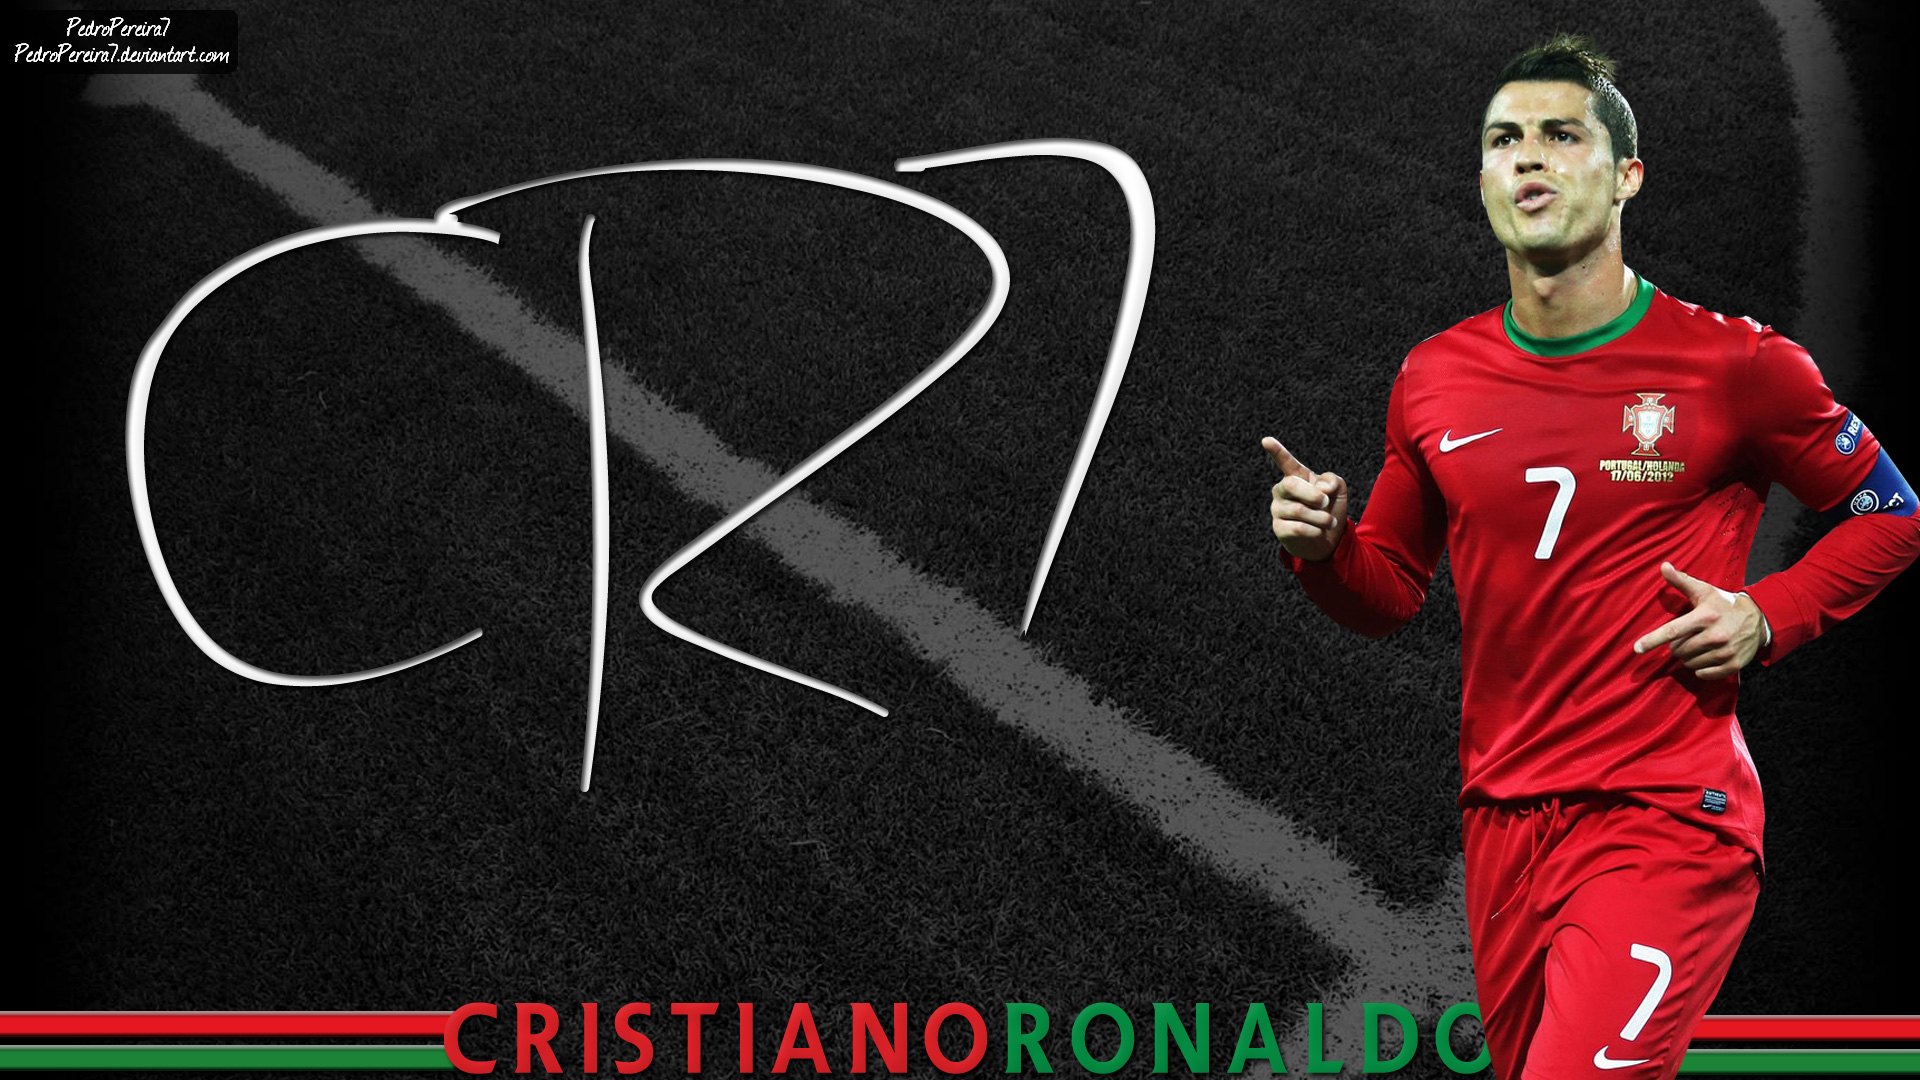 Cristiano Ronaldo 7 by PedroPereira7 on DeviantArt